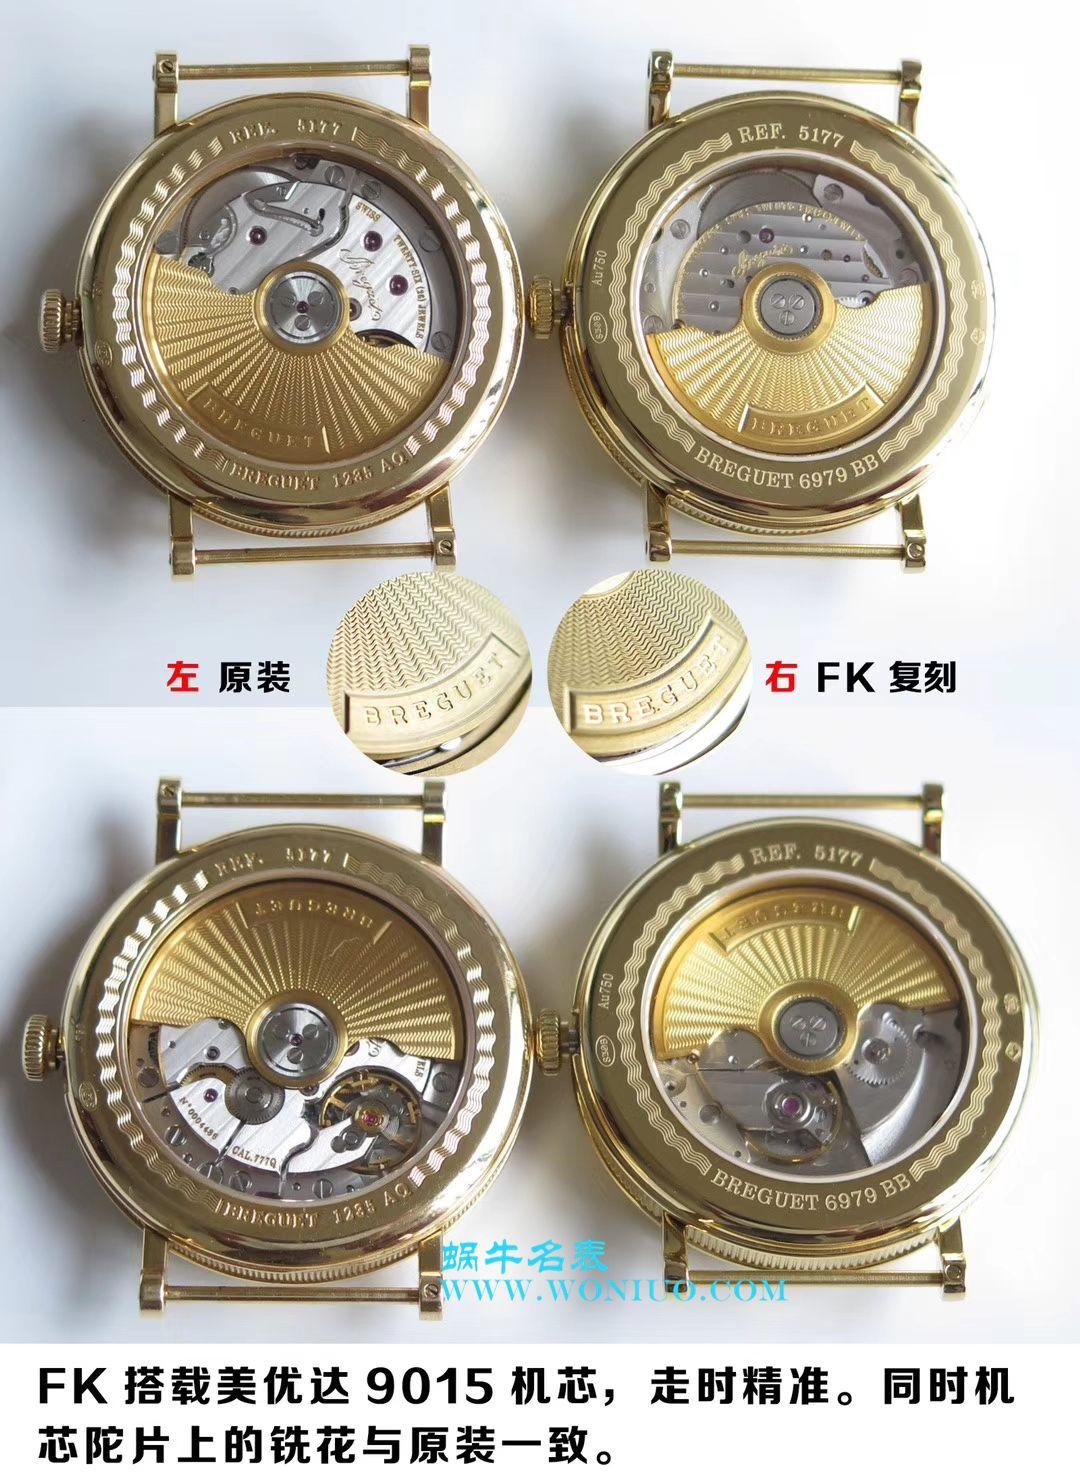 【FK厂复刻一比一精仿手表】宝玑经典系列5177BB/15/9V6腕表